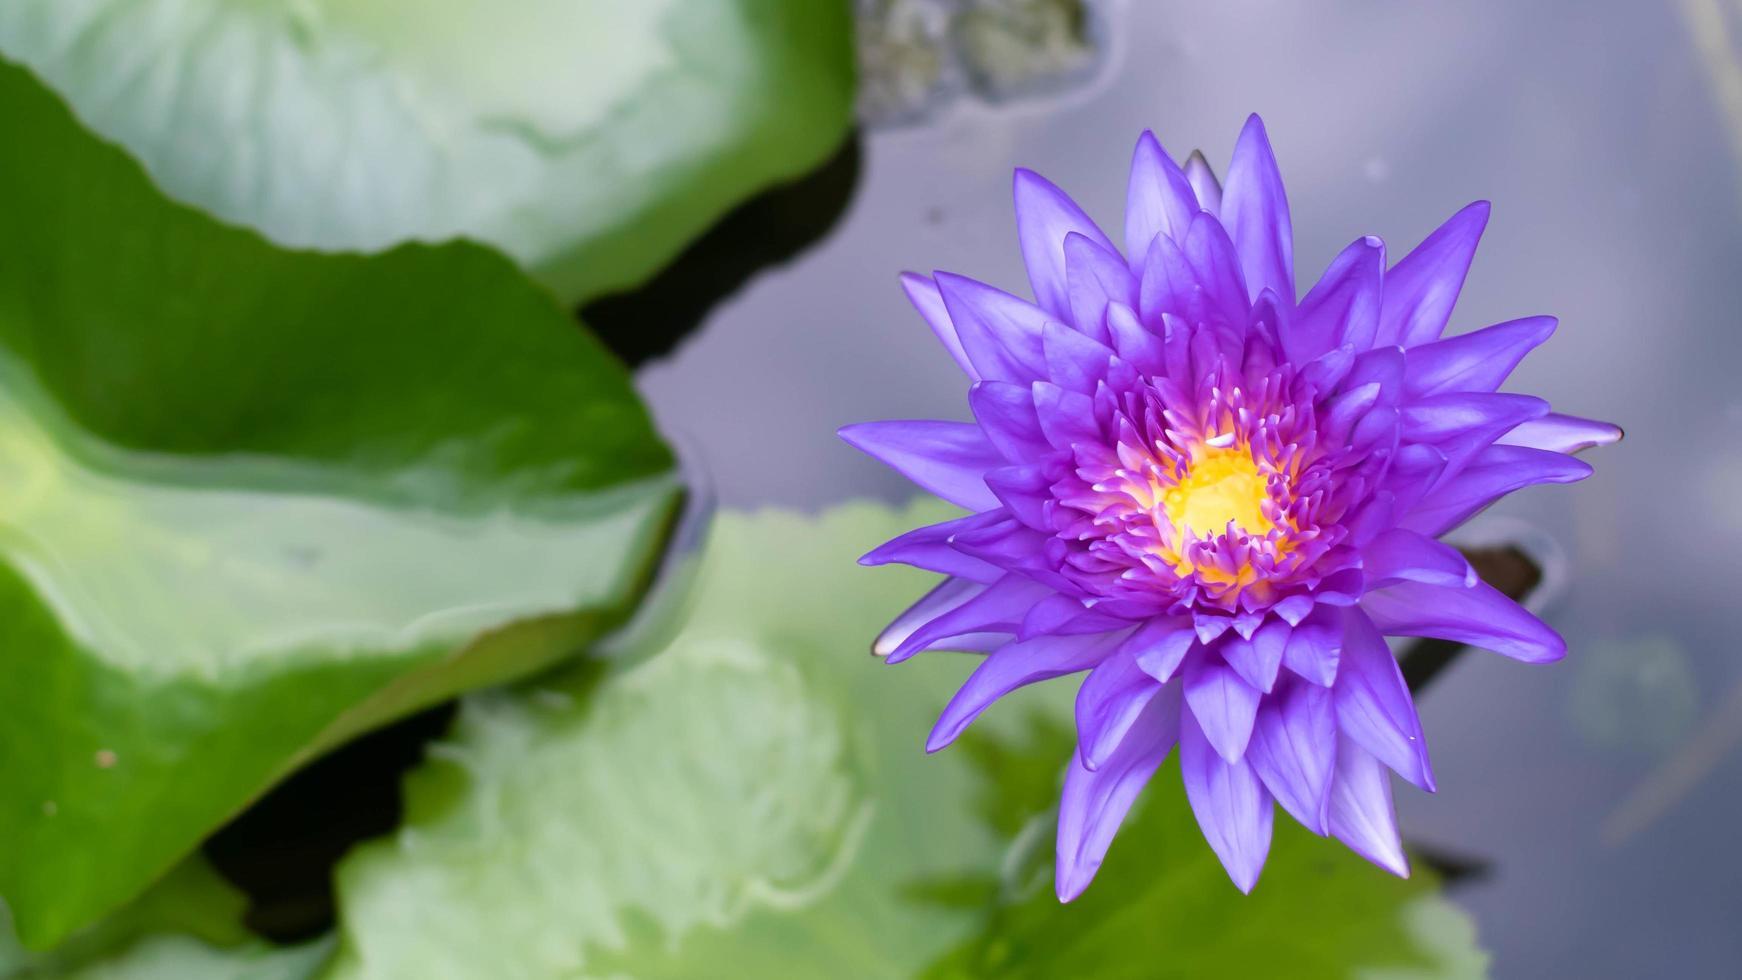 lótus violeta florescendo na lagoa. flores de lótus roxas brilhantes na lagoa. foto